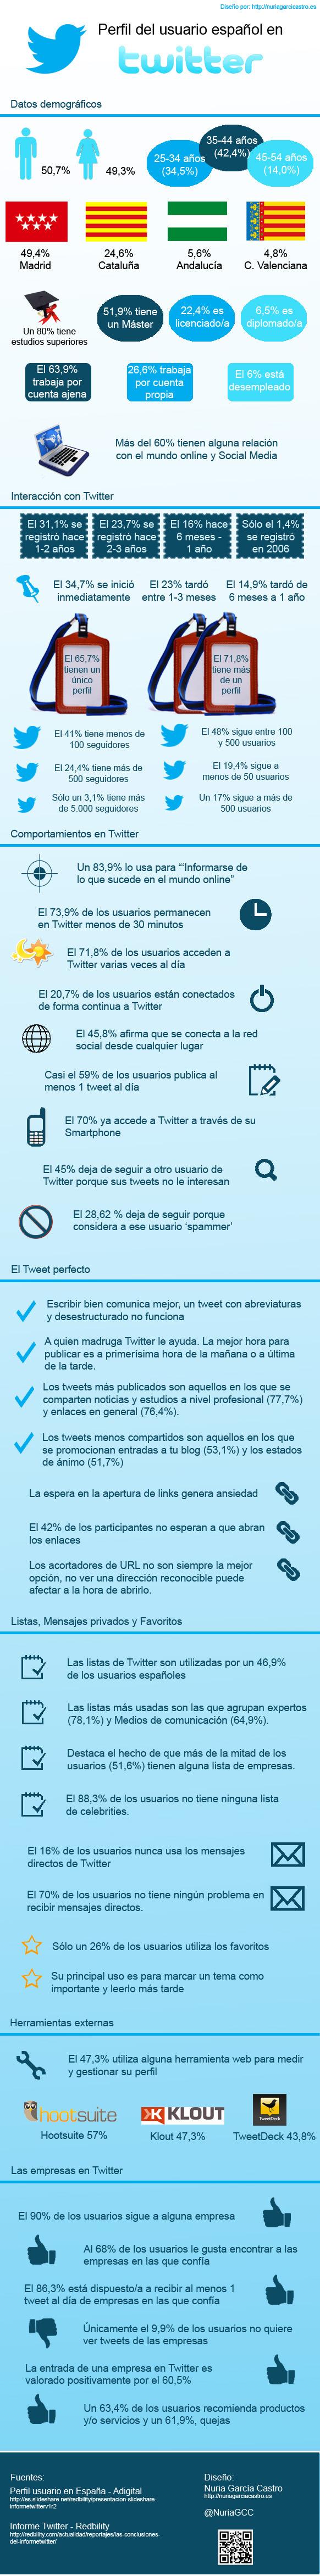 Perfil del usuario español de Twitter #infografía